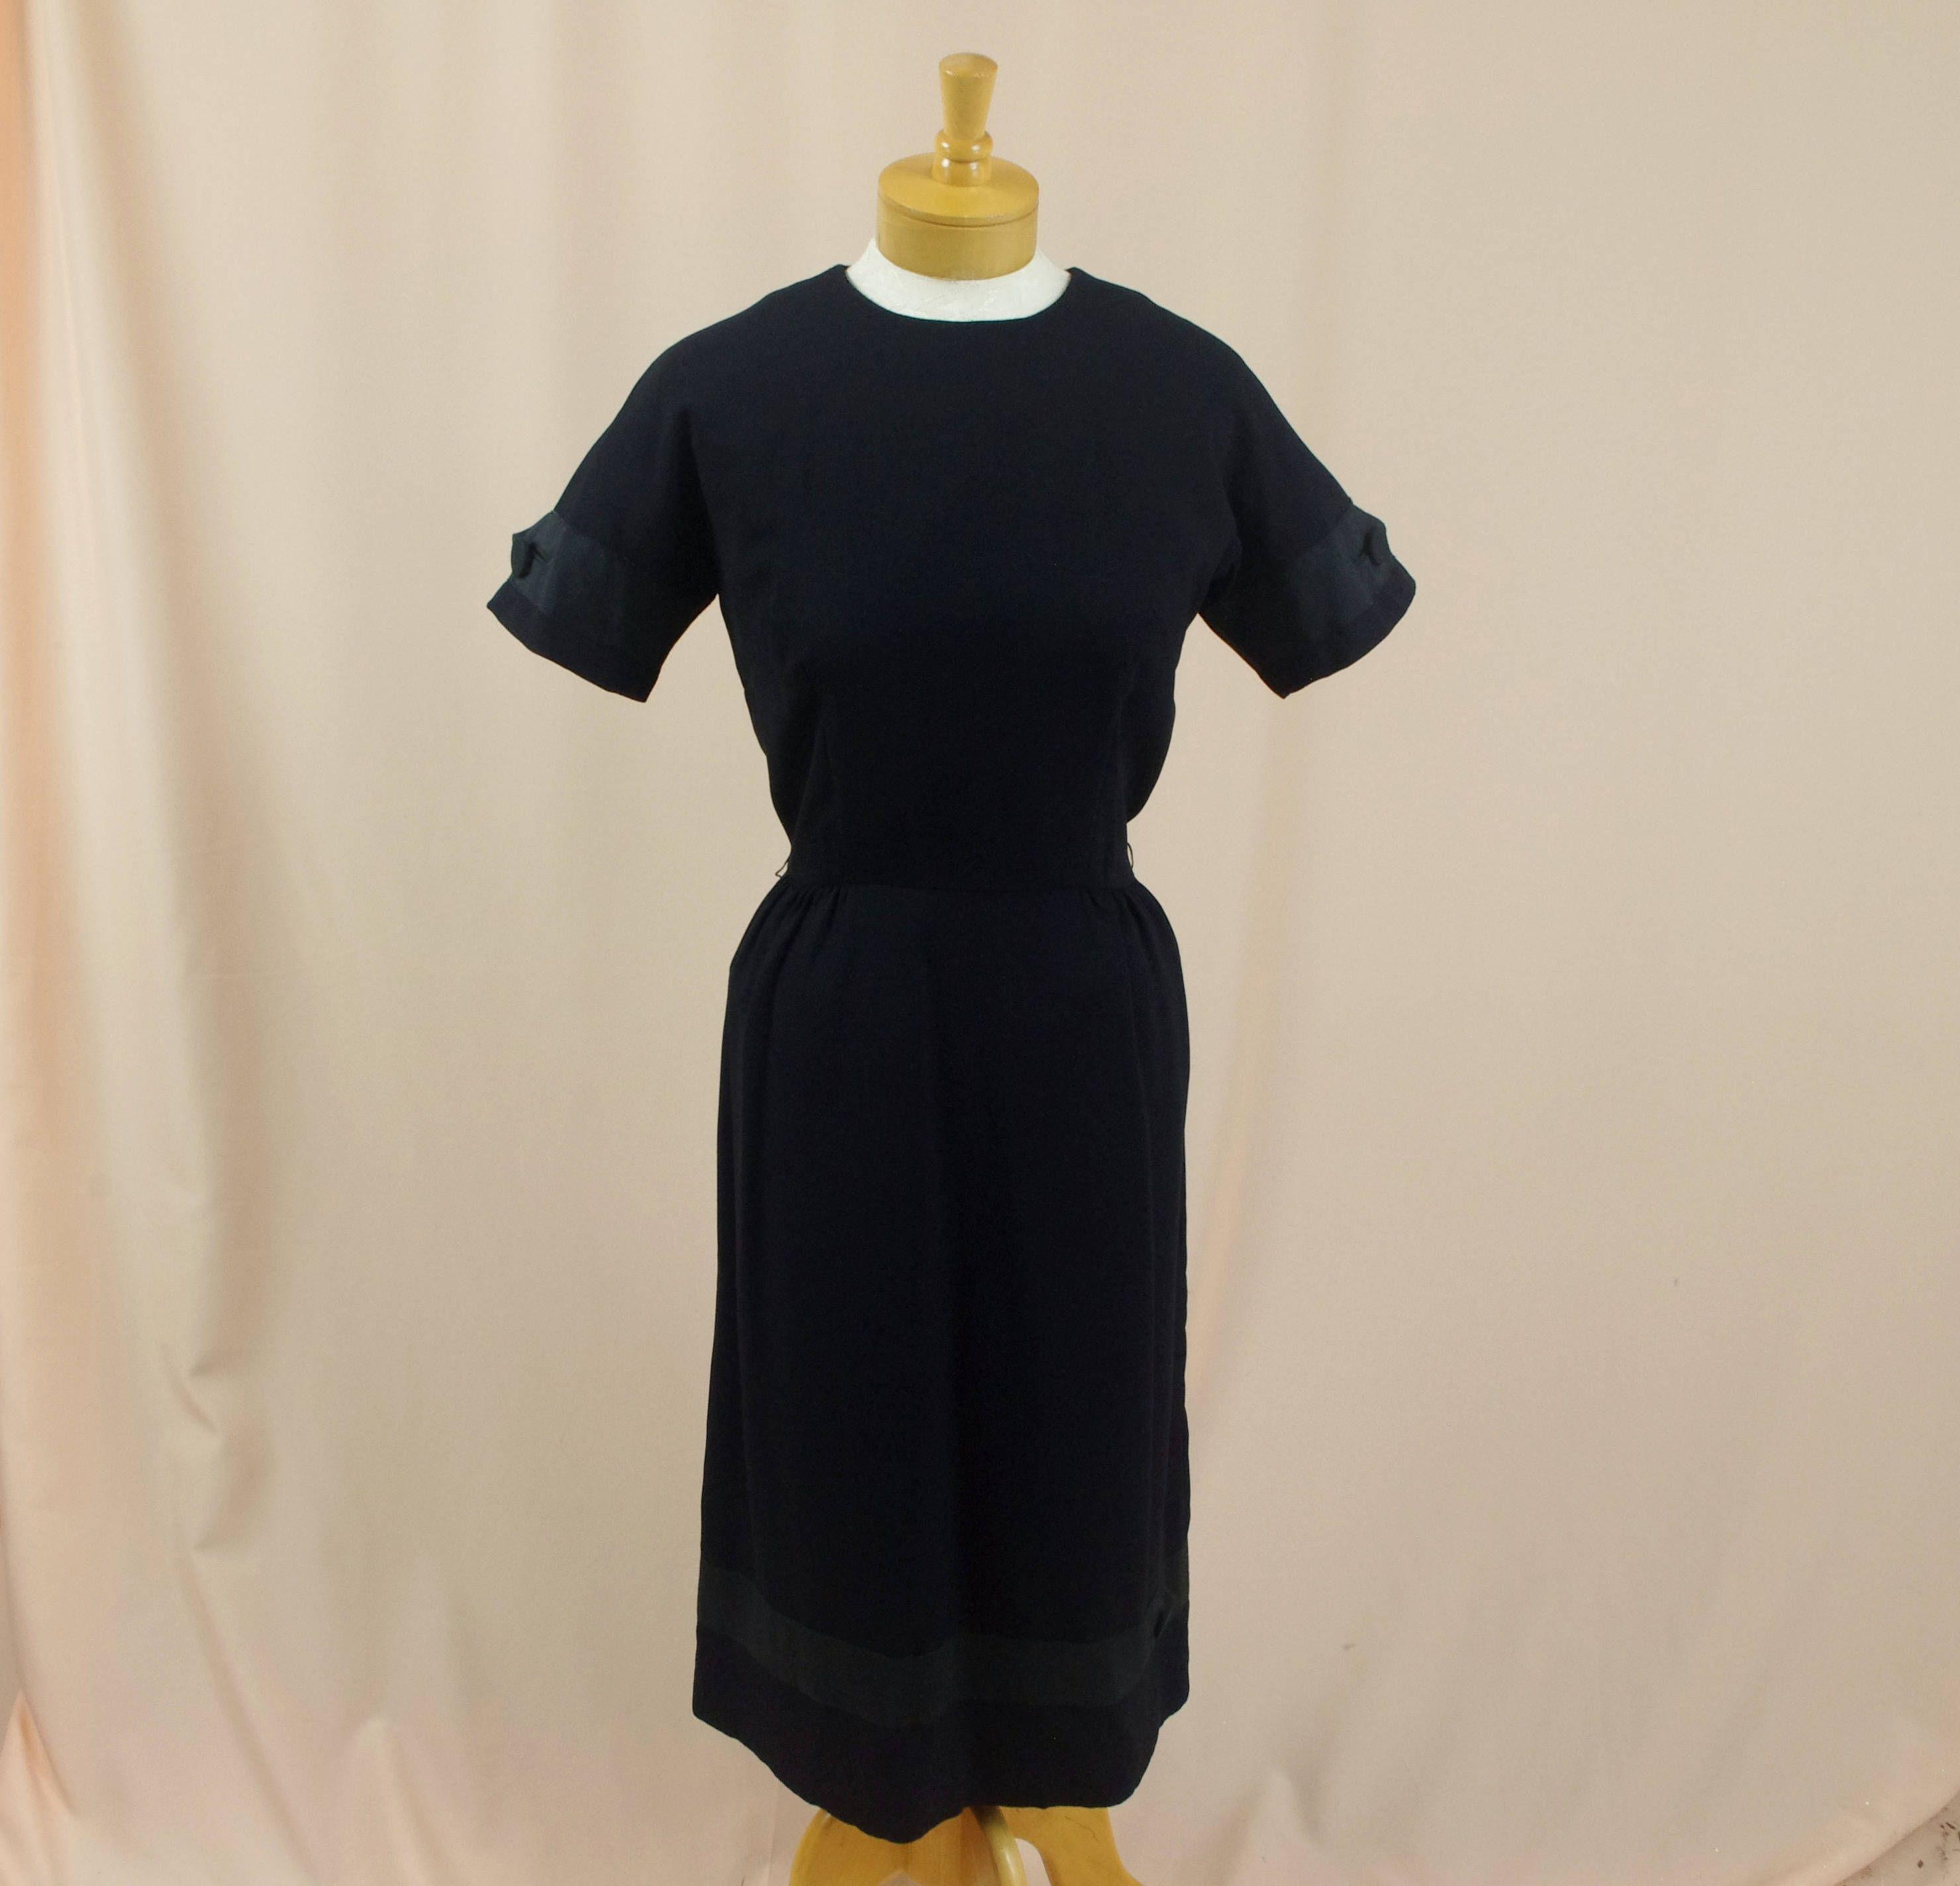 60s Wiggle Dress Black Crepe Dress Black Dress 60s Dress Etsy Black Wiggle Dress Crepe Dress 60s Dress [ 2848 x 2960 Pixel ]